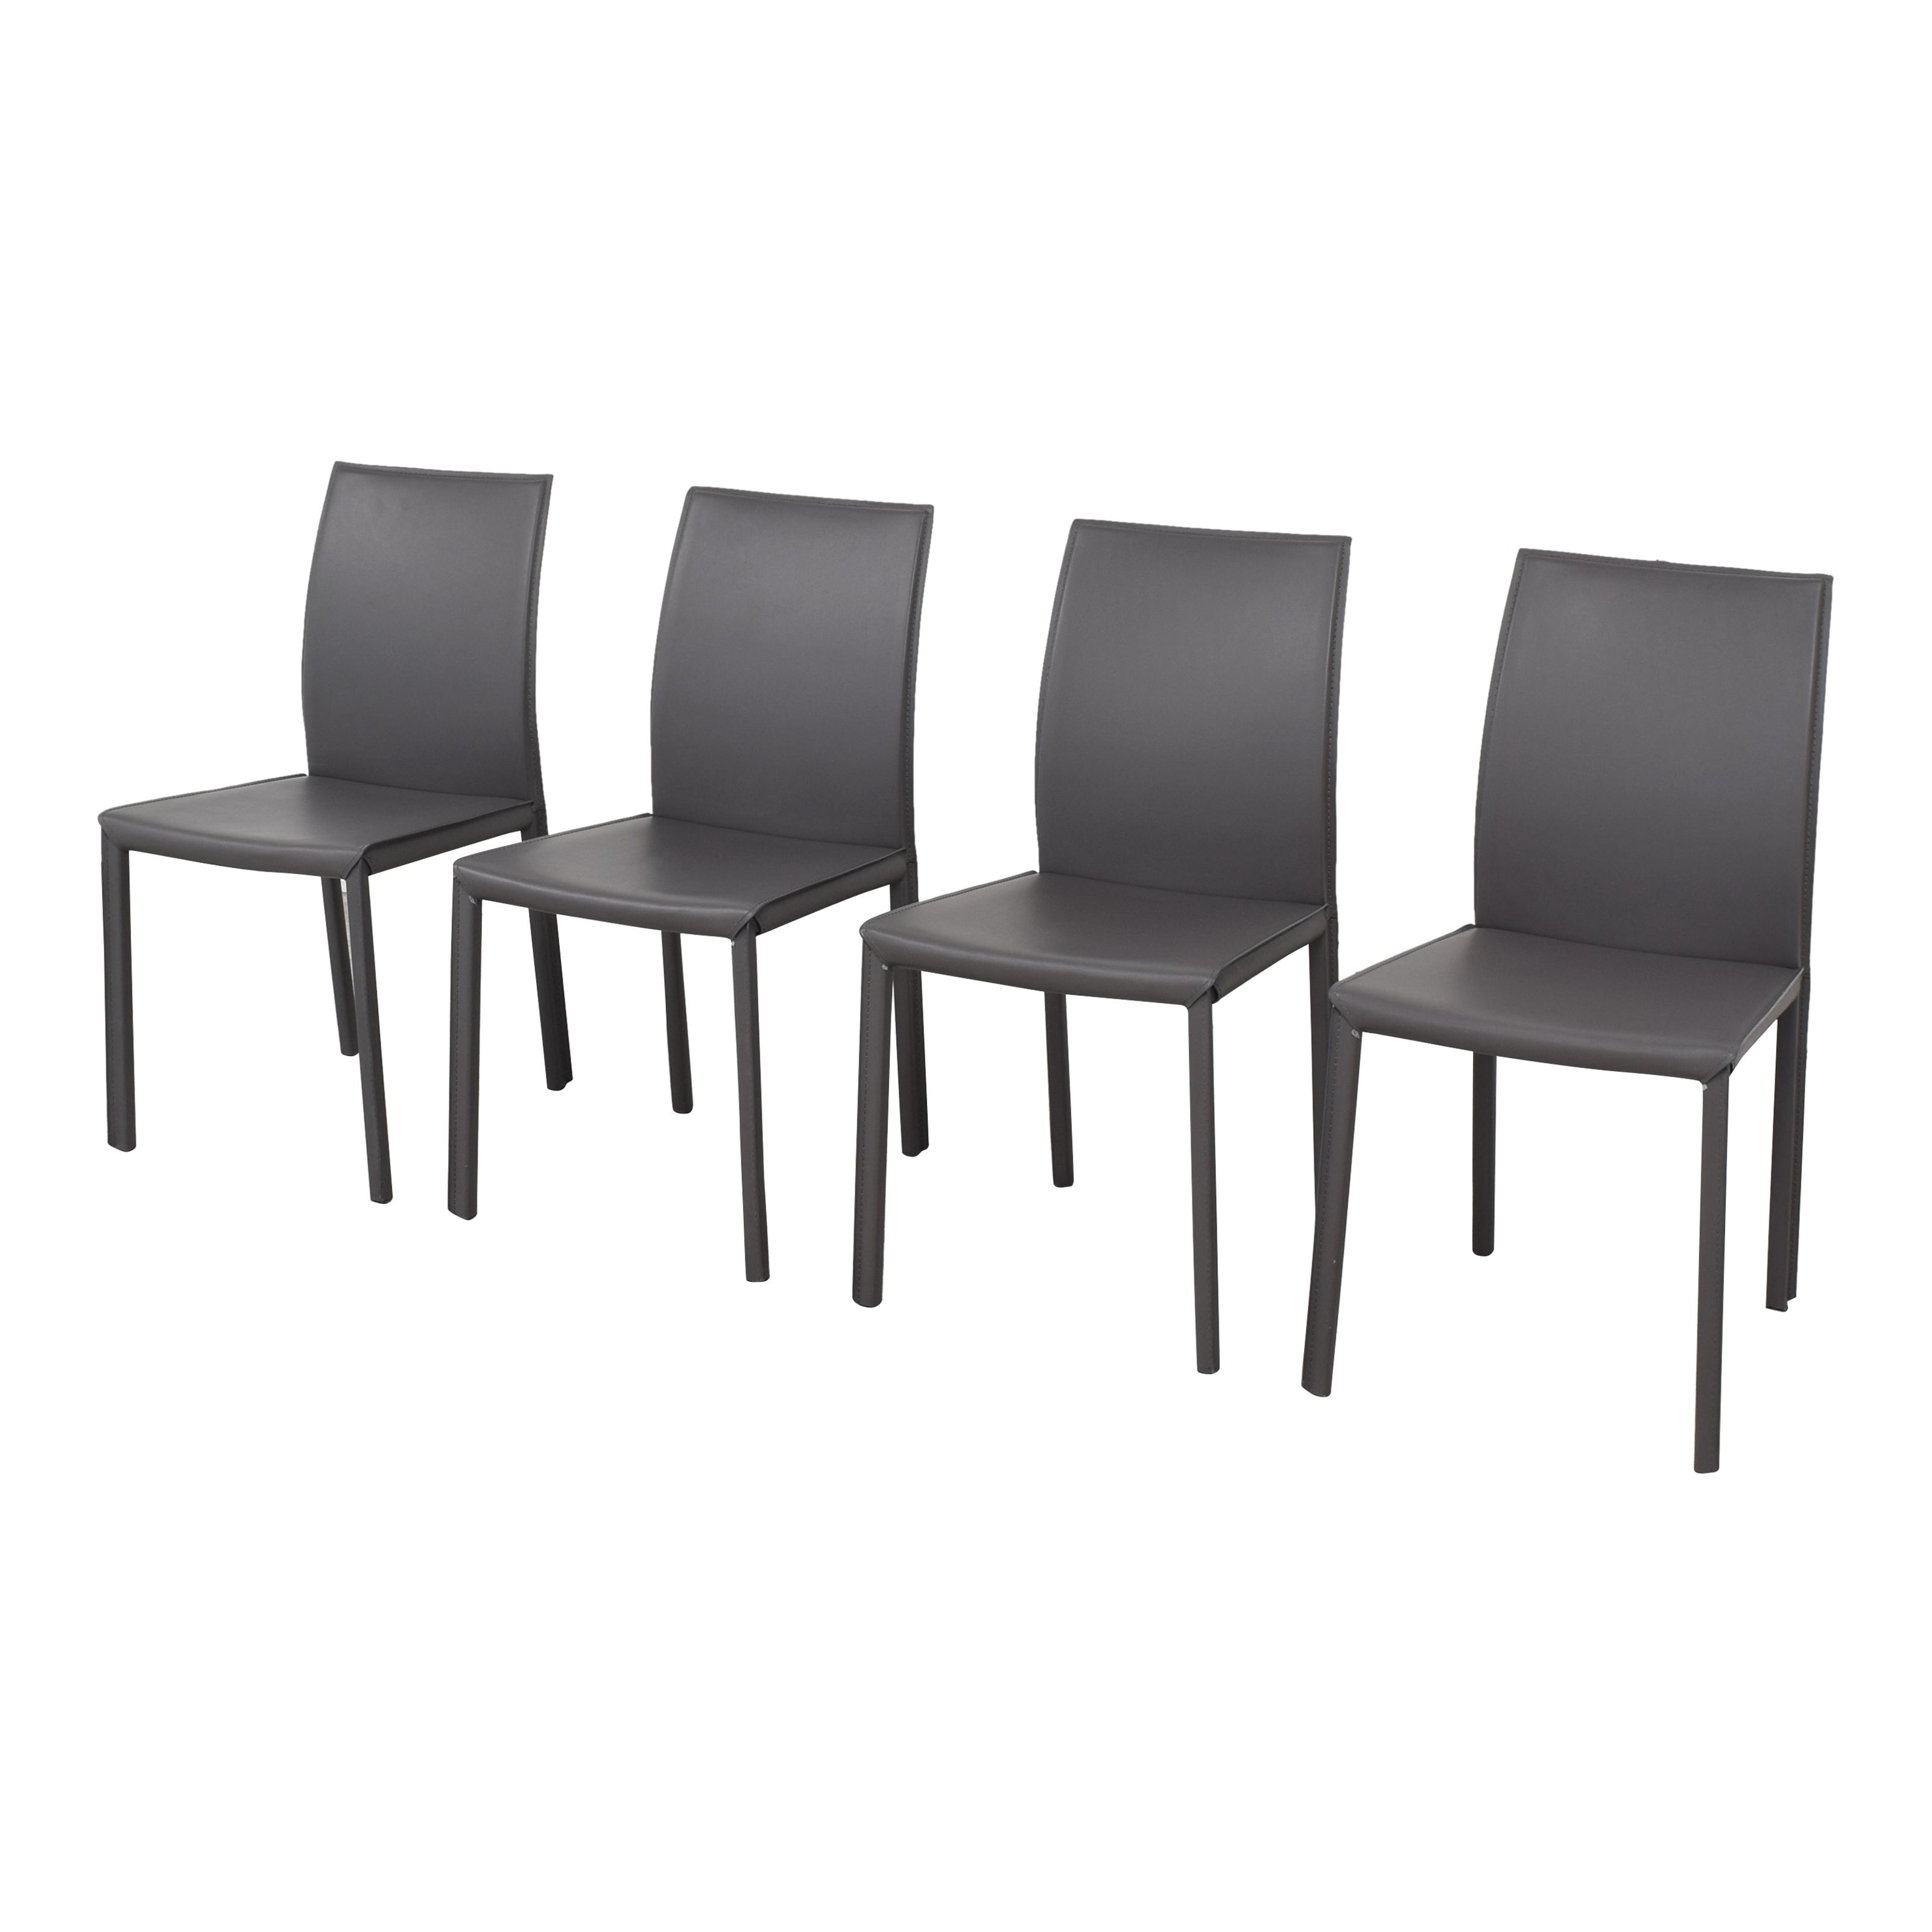 BoConcept BoConcept Zarra Dining Chairs dimensions